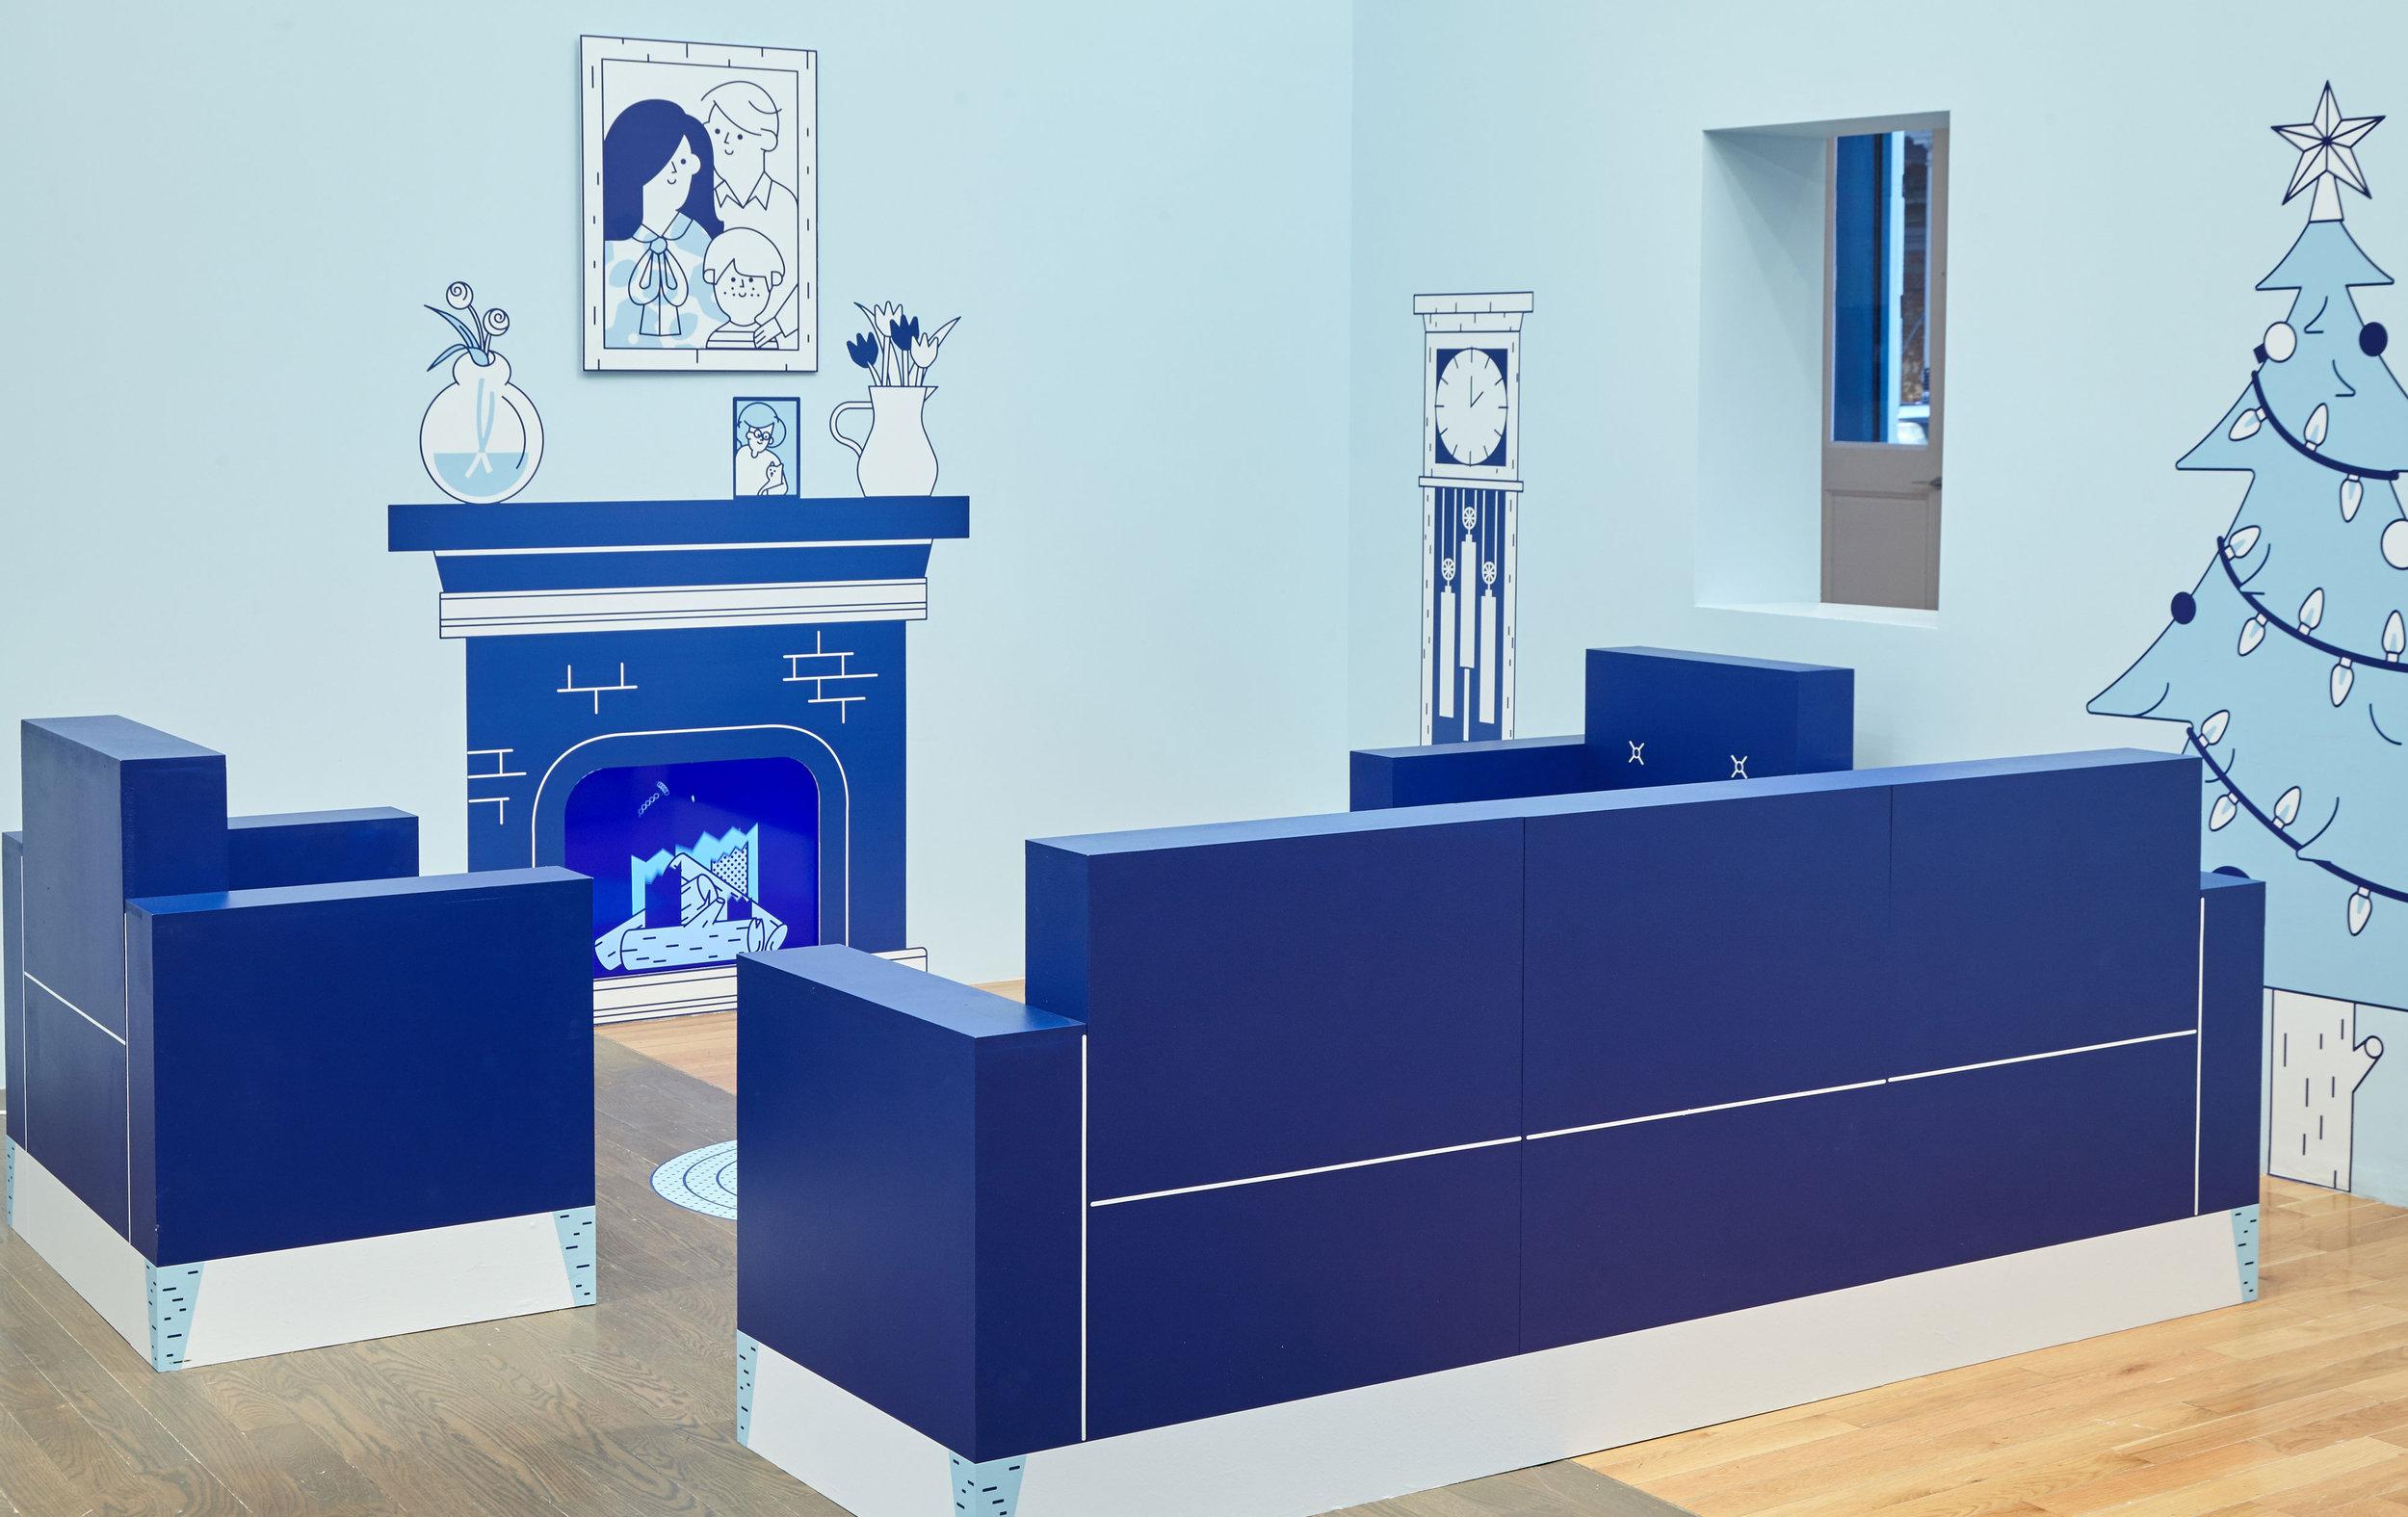 casper-nyc-popup-livingroom.jpg